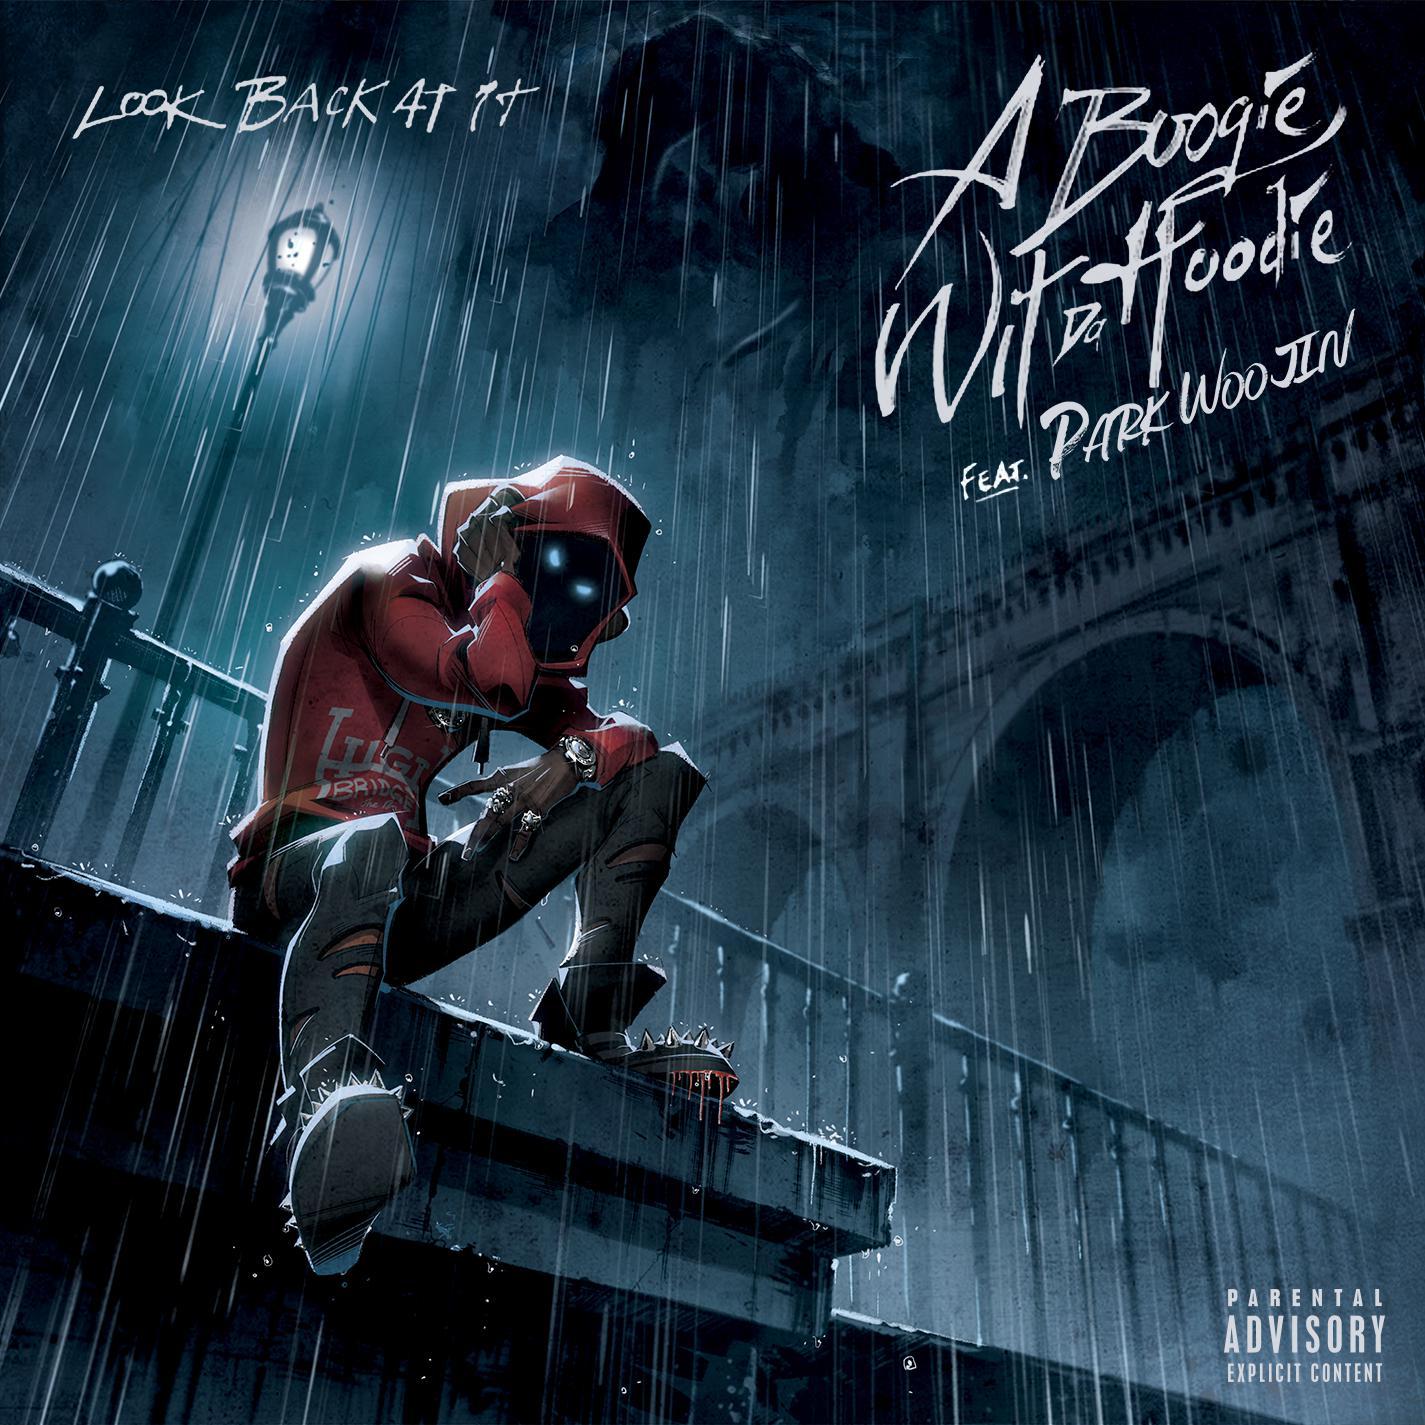 A Boogie Wit da Hoodie/朴佑镇 - Look Back At It(新歌首发).音乐mp3.百度云网盘下载